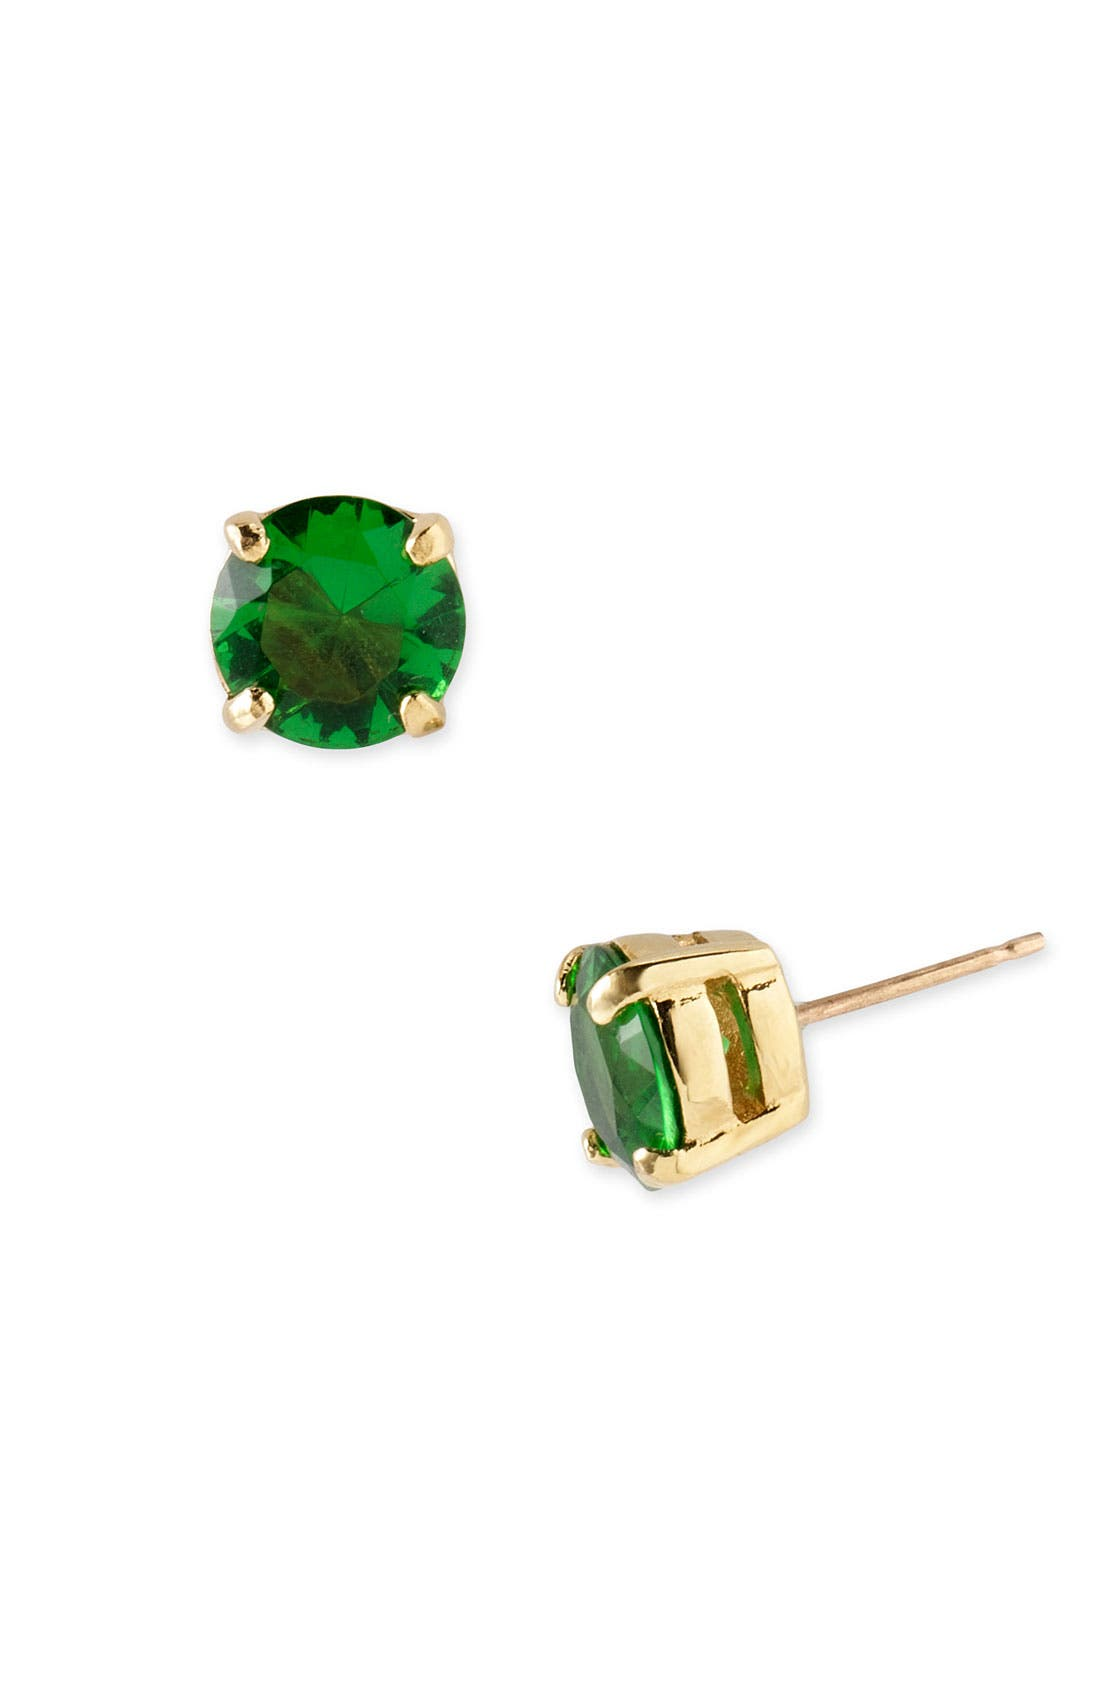 KATE SPADE NEW YORK,                             'cueva rosa' stud earrings,                             Main thumbnail 1, color,                             300